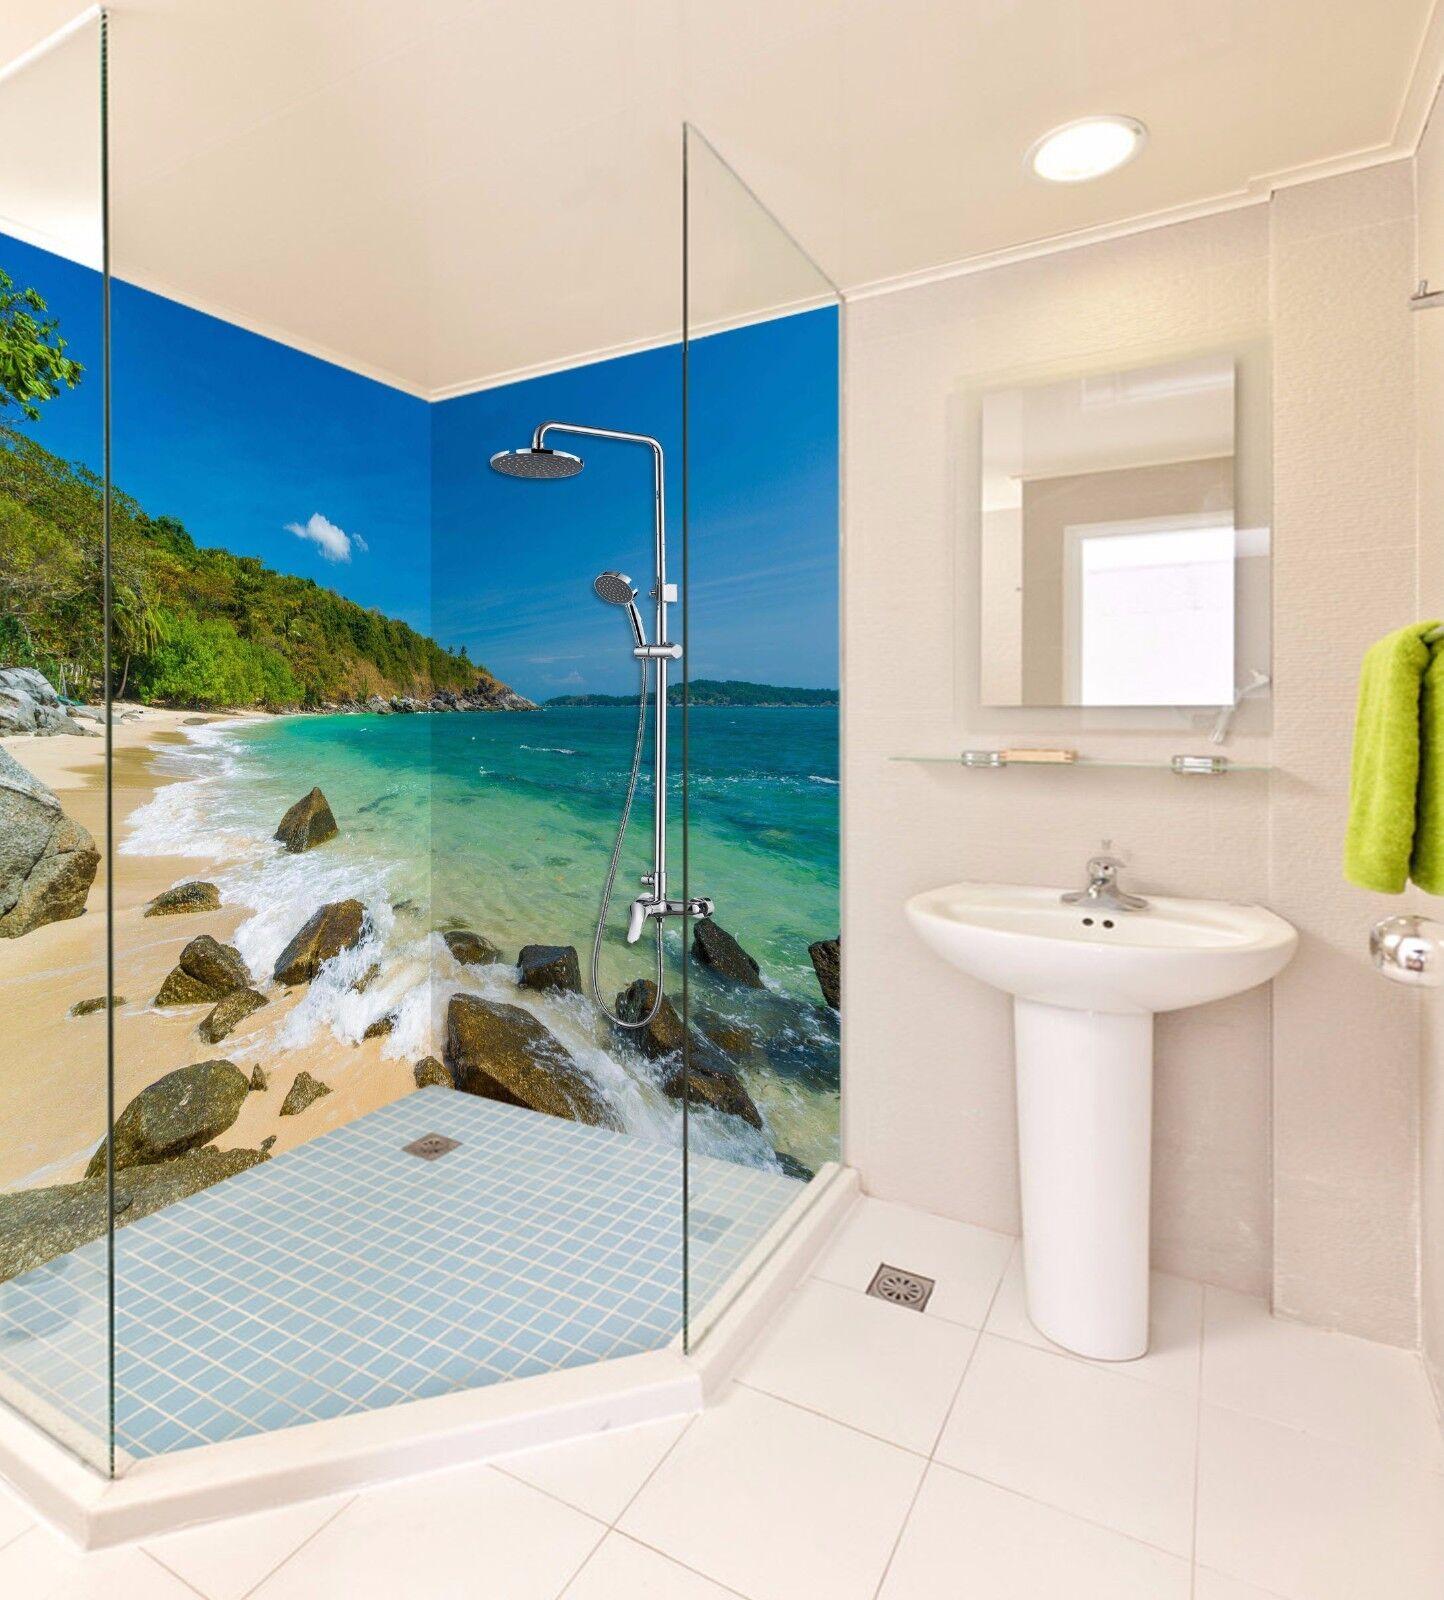 3D Ocean Sky Beach WallPaper Bathroom Print Decal Wall Deco AJ WALLPAPER UK